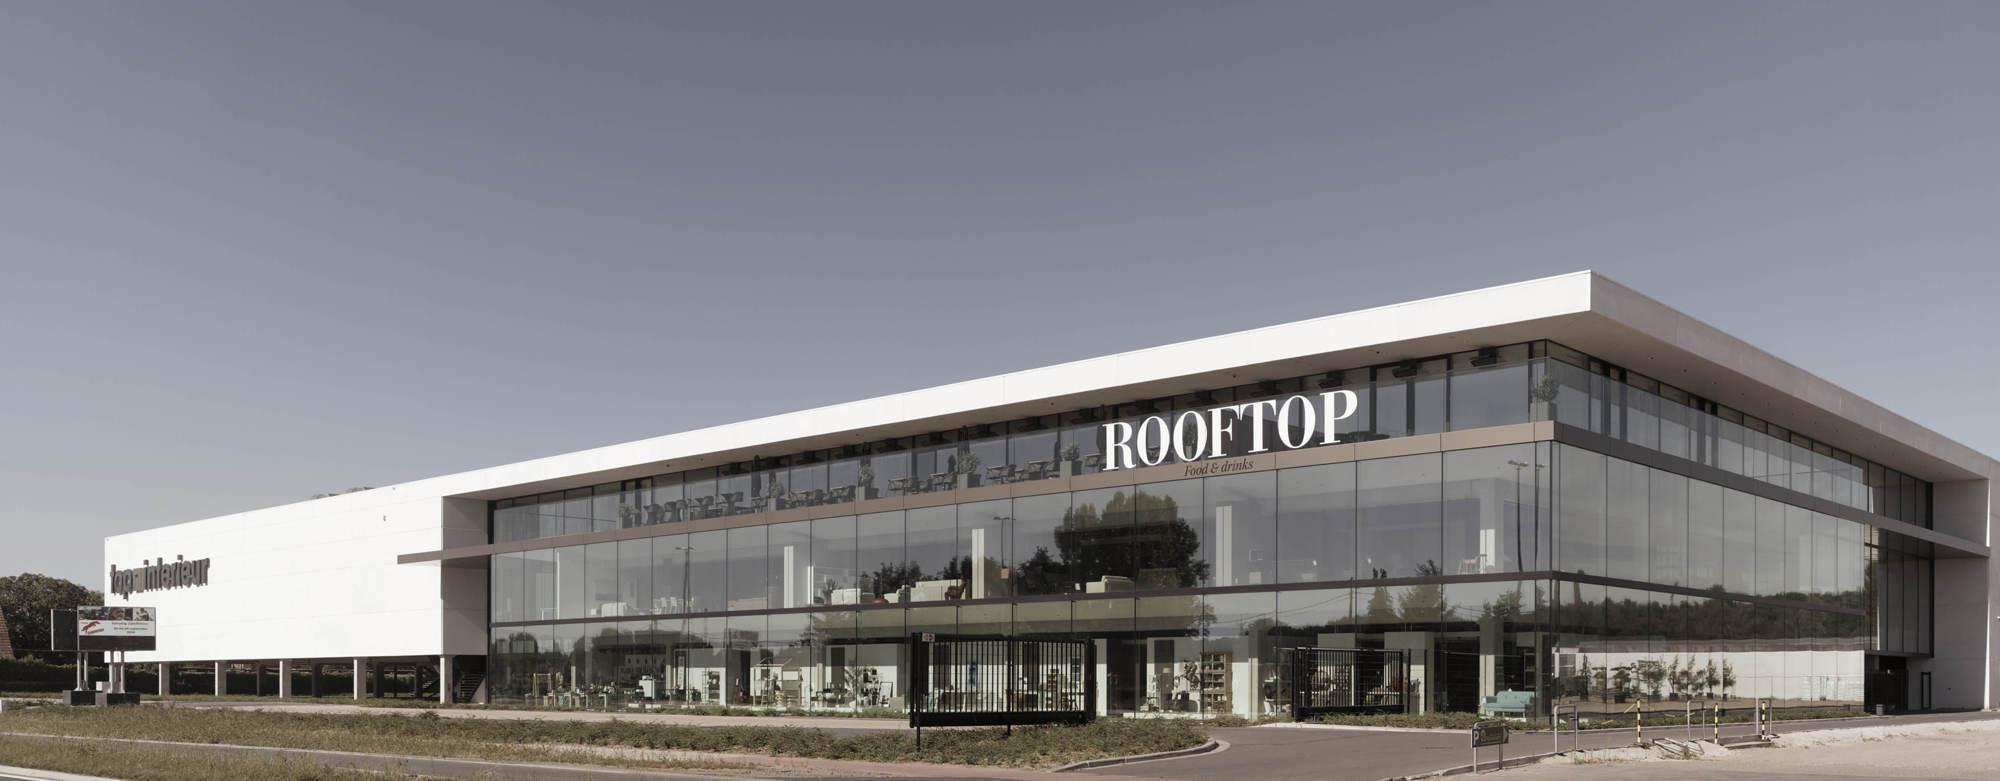 The rooftop Massenhoven